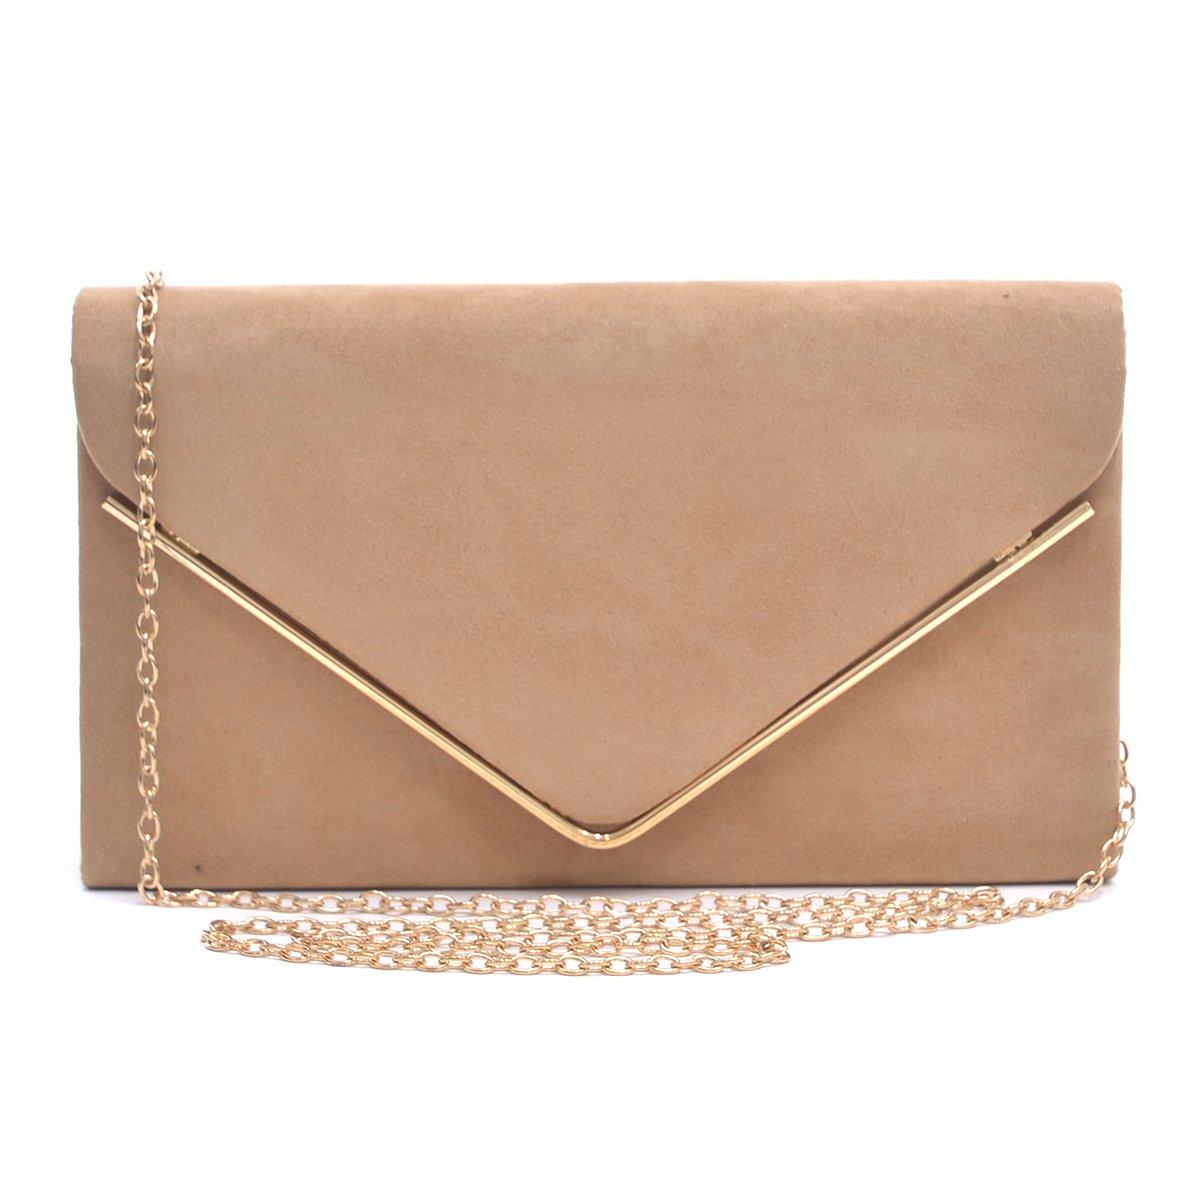 Dasein Ladies' Velvet Evening Clutch Handbag Formal Party Clutch For Women With Chain Strap (Camel)